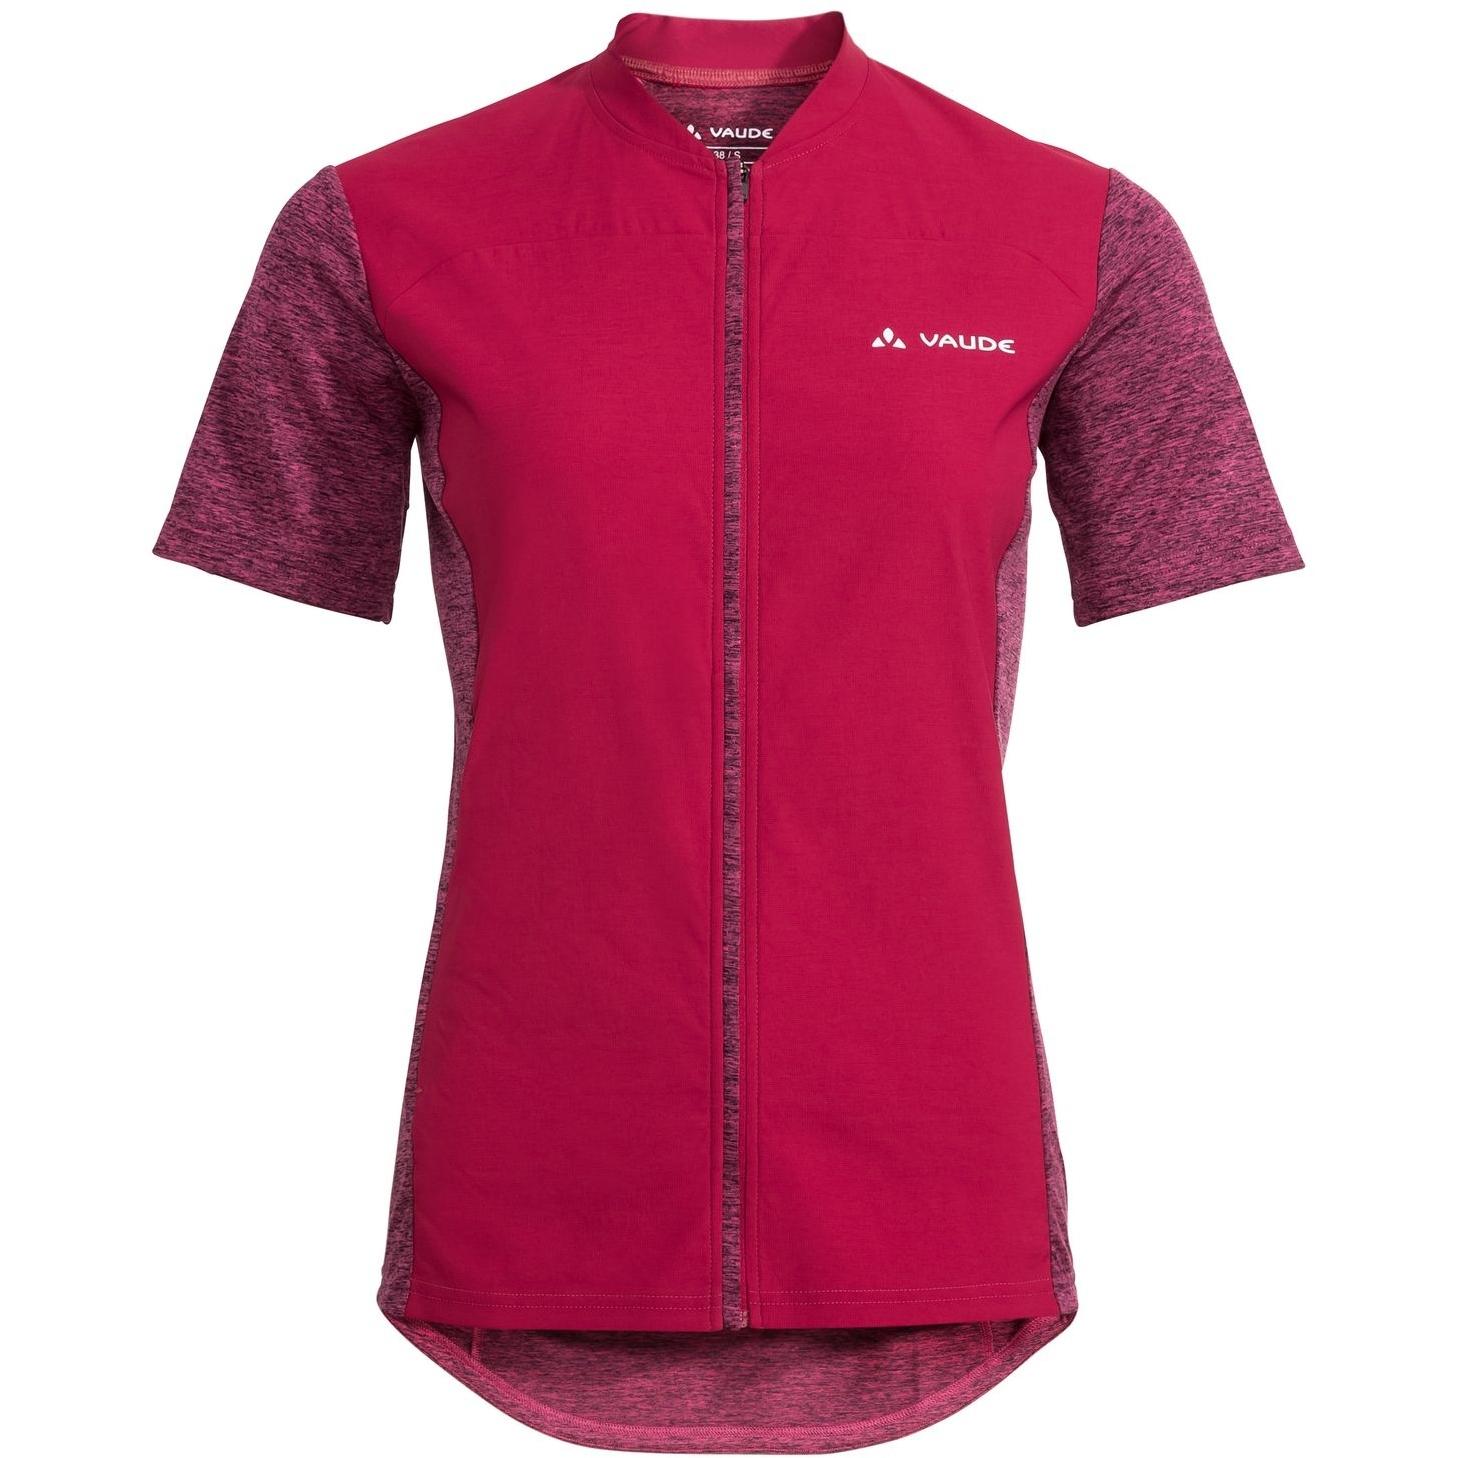 Vaude Qimsa Wind Damen T-Shirt - crimson red